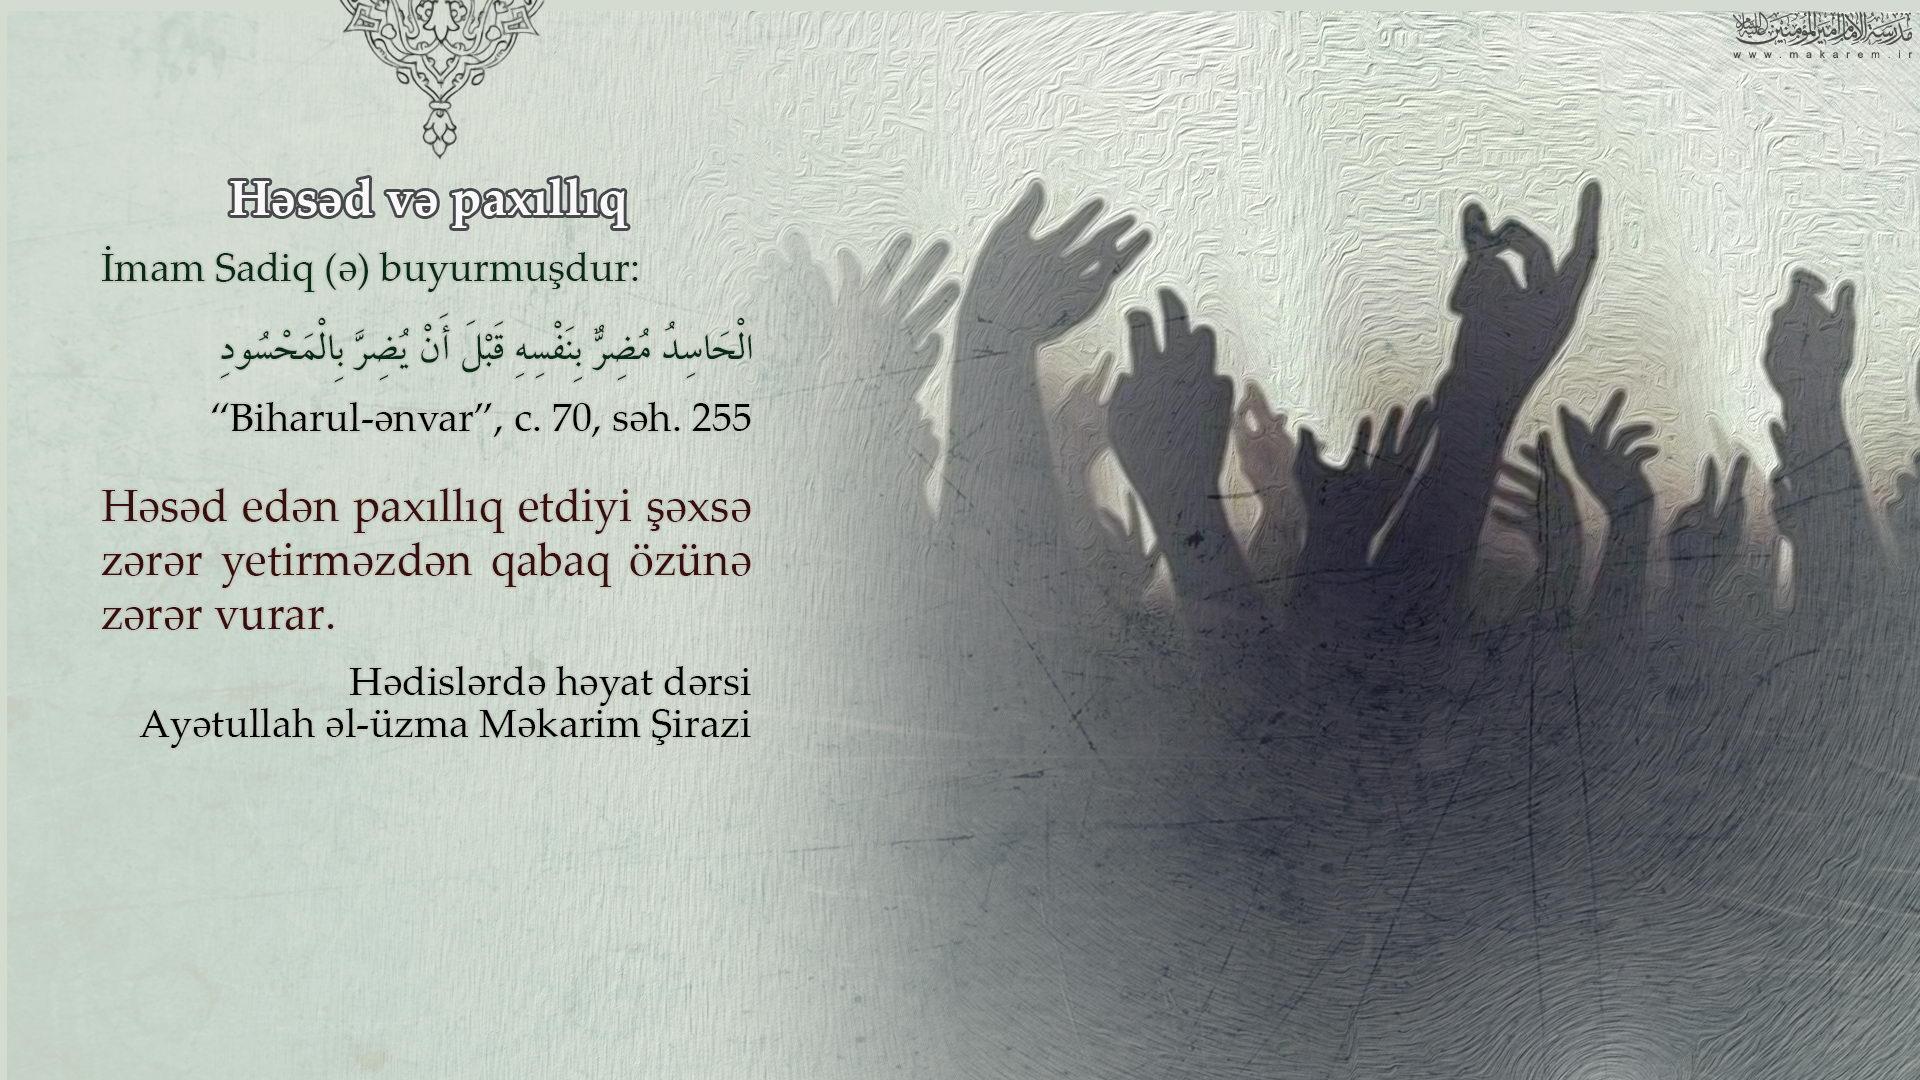 150-016-مدرسه الامام امیر المومنین (ع)